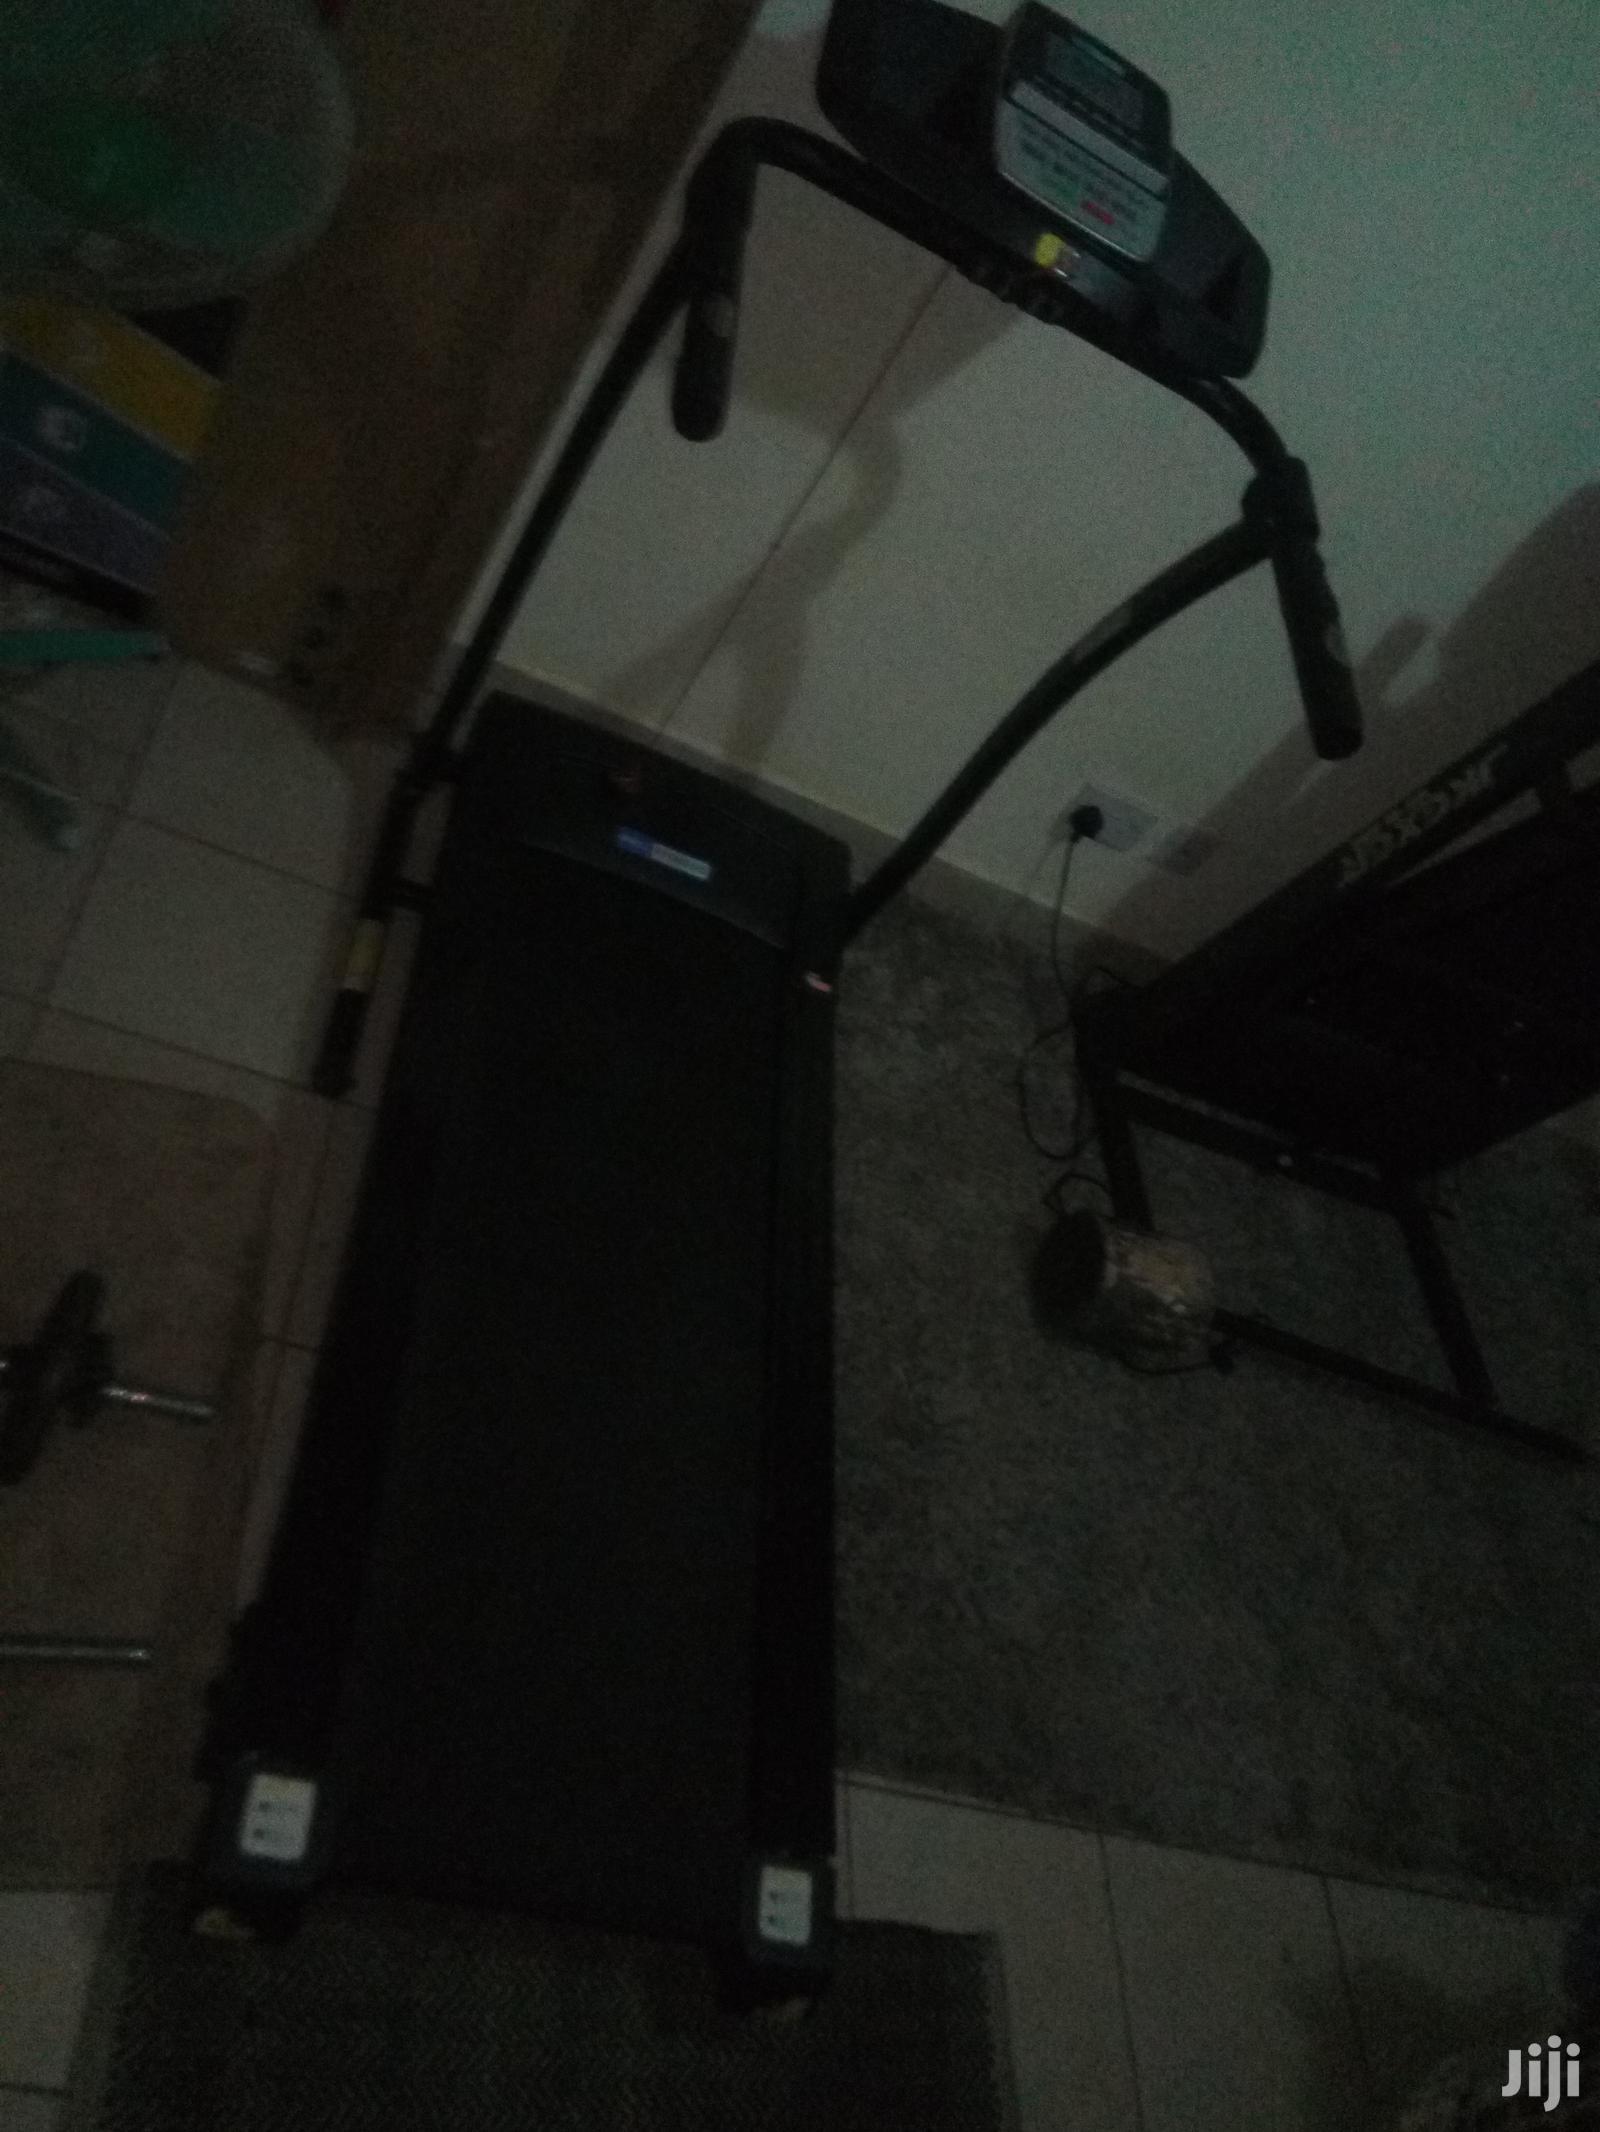 Electric Treadmill And Gym Weights For Sale | Sports Equipment for sale in Kikuyu, Kiambu, Kenya